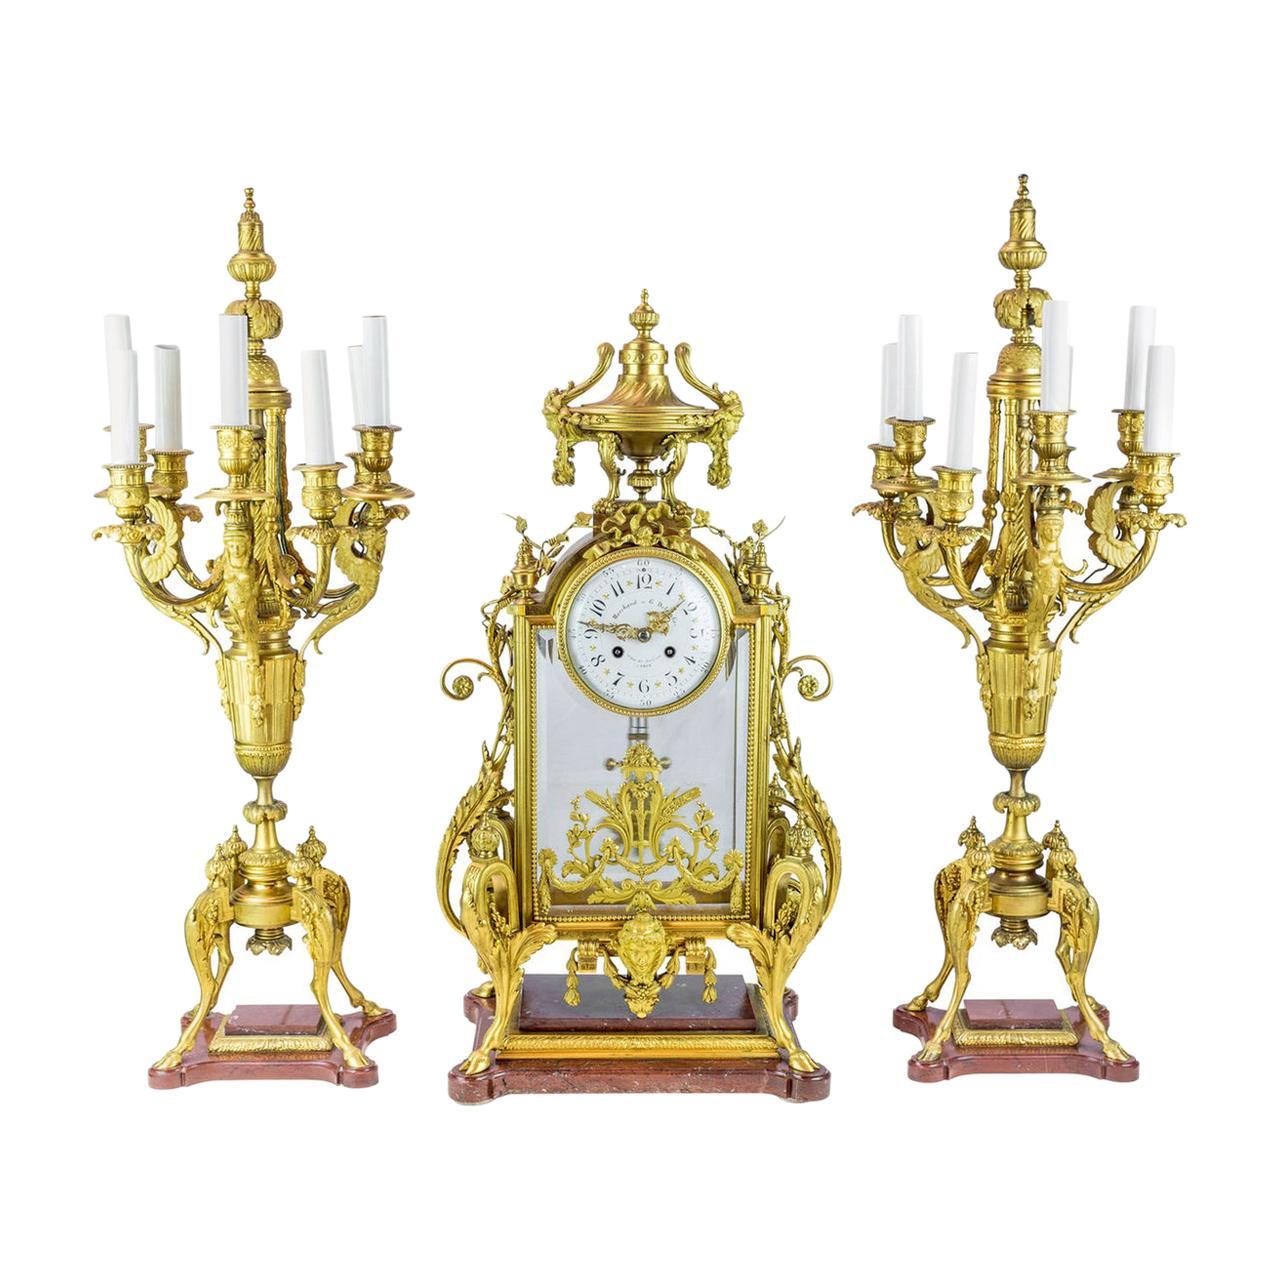 19th Century Napoleon III Ormolu Clock Set Attributed to Ferdinand Barbedienne